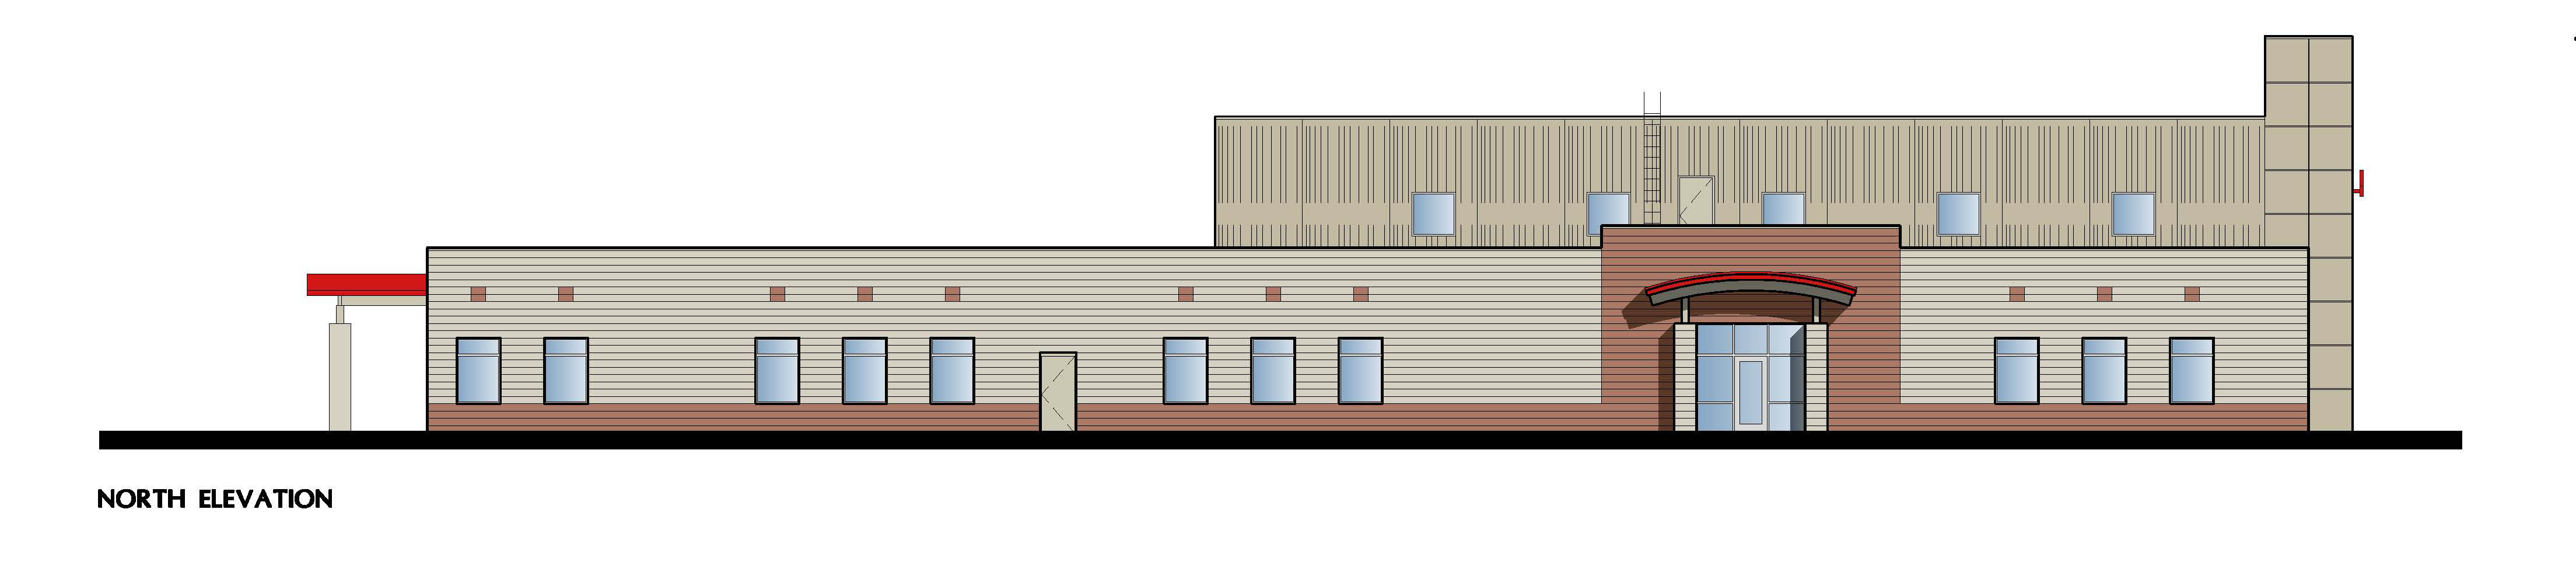 New Building for Jam Hops in Ham Lake! - Premier Commercial